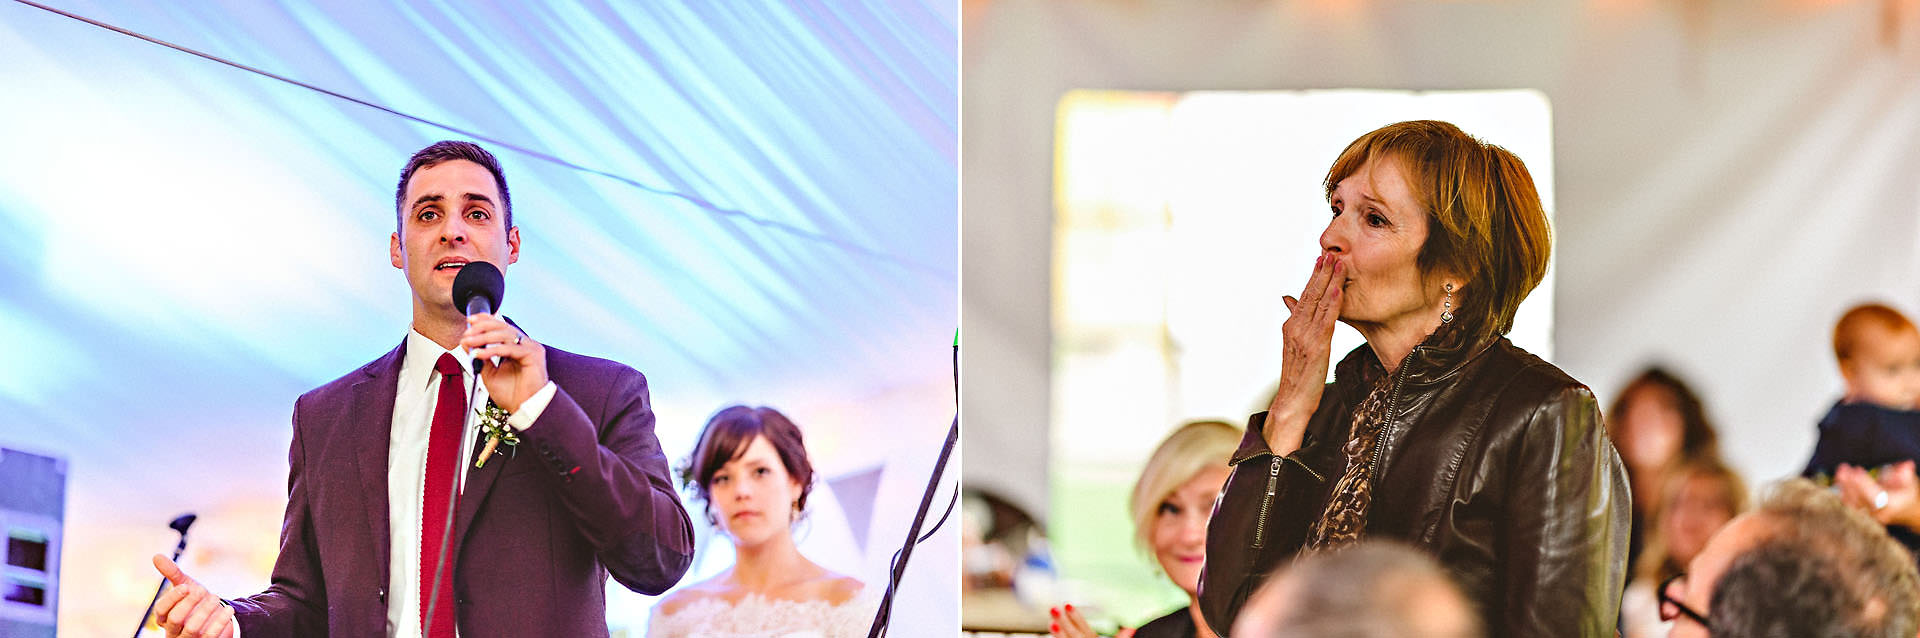 wedding speeches crying groom